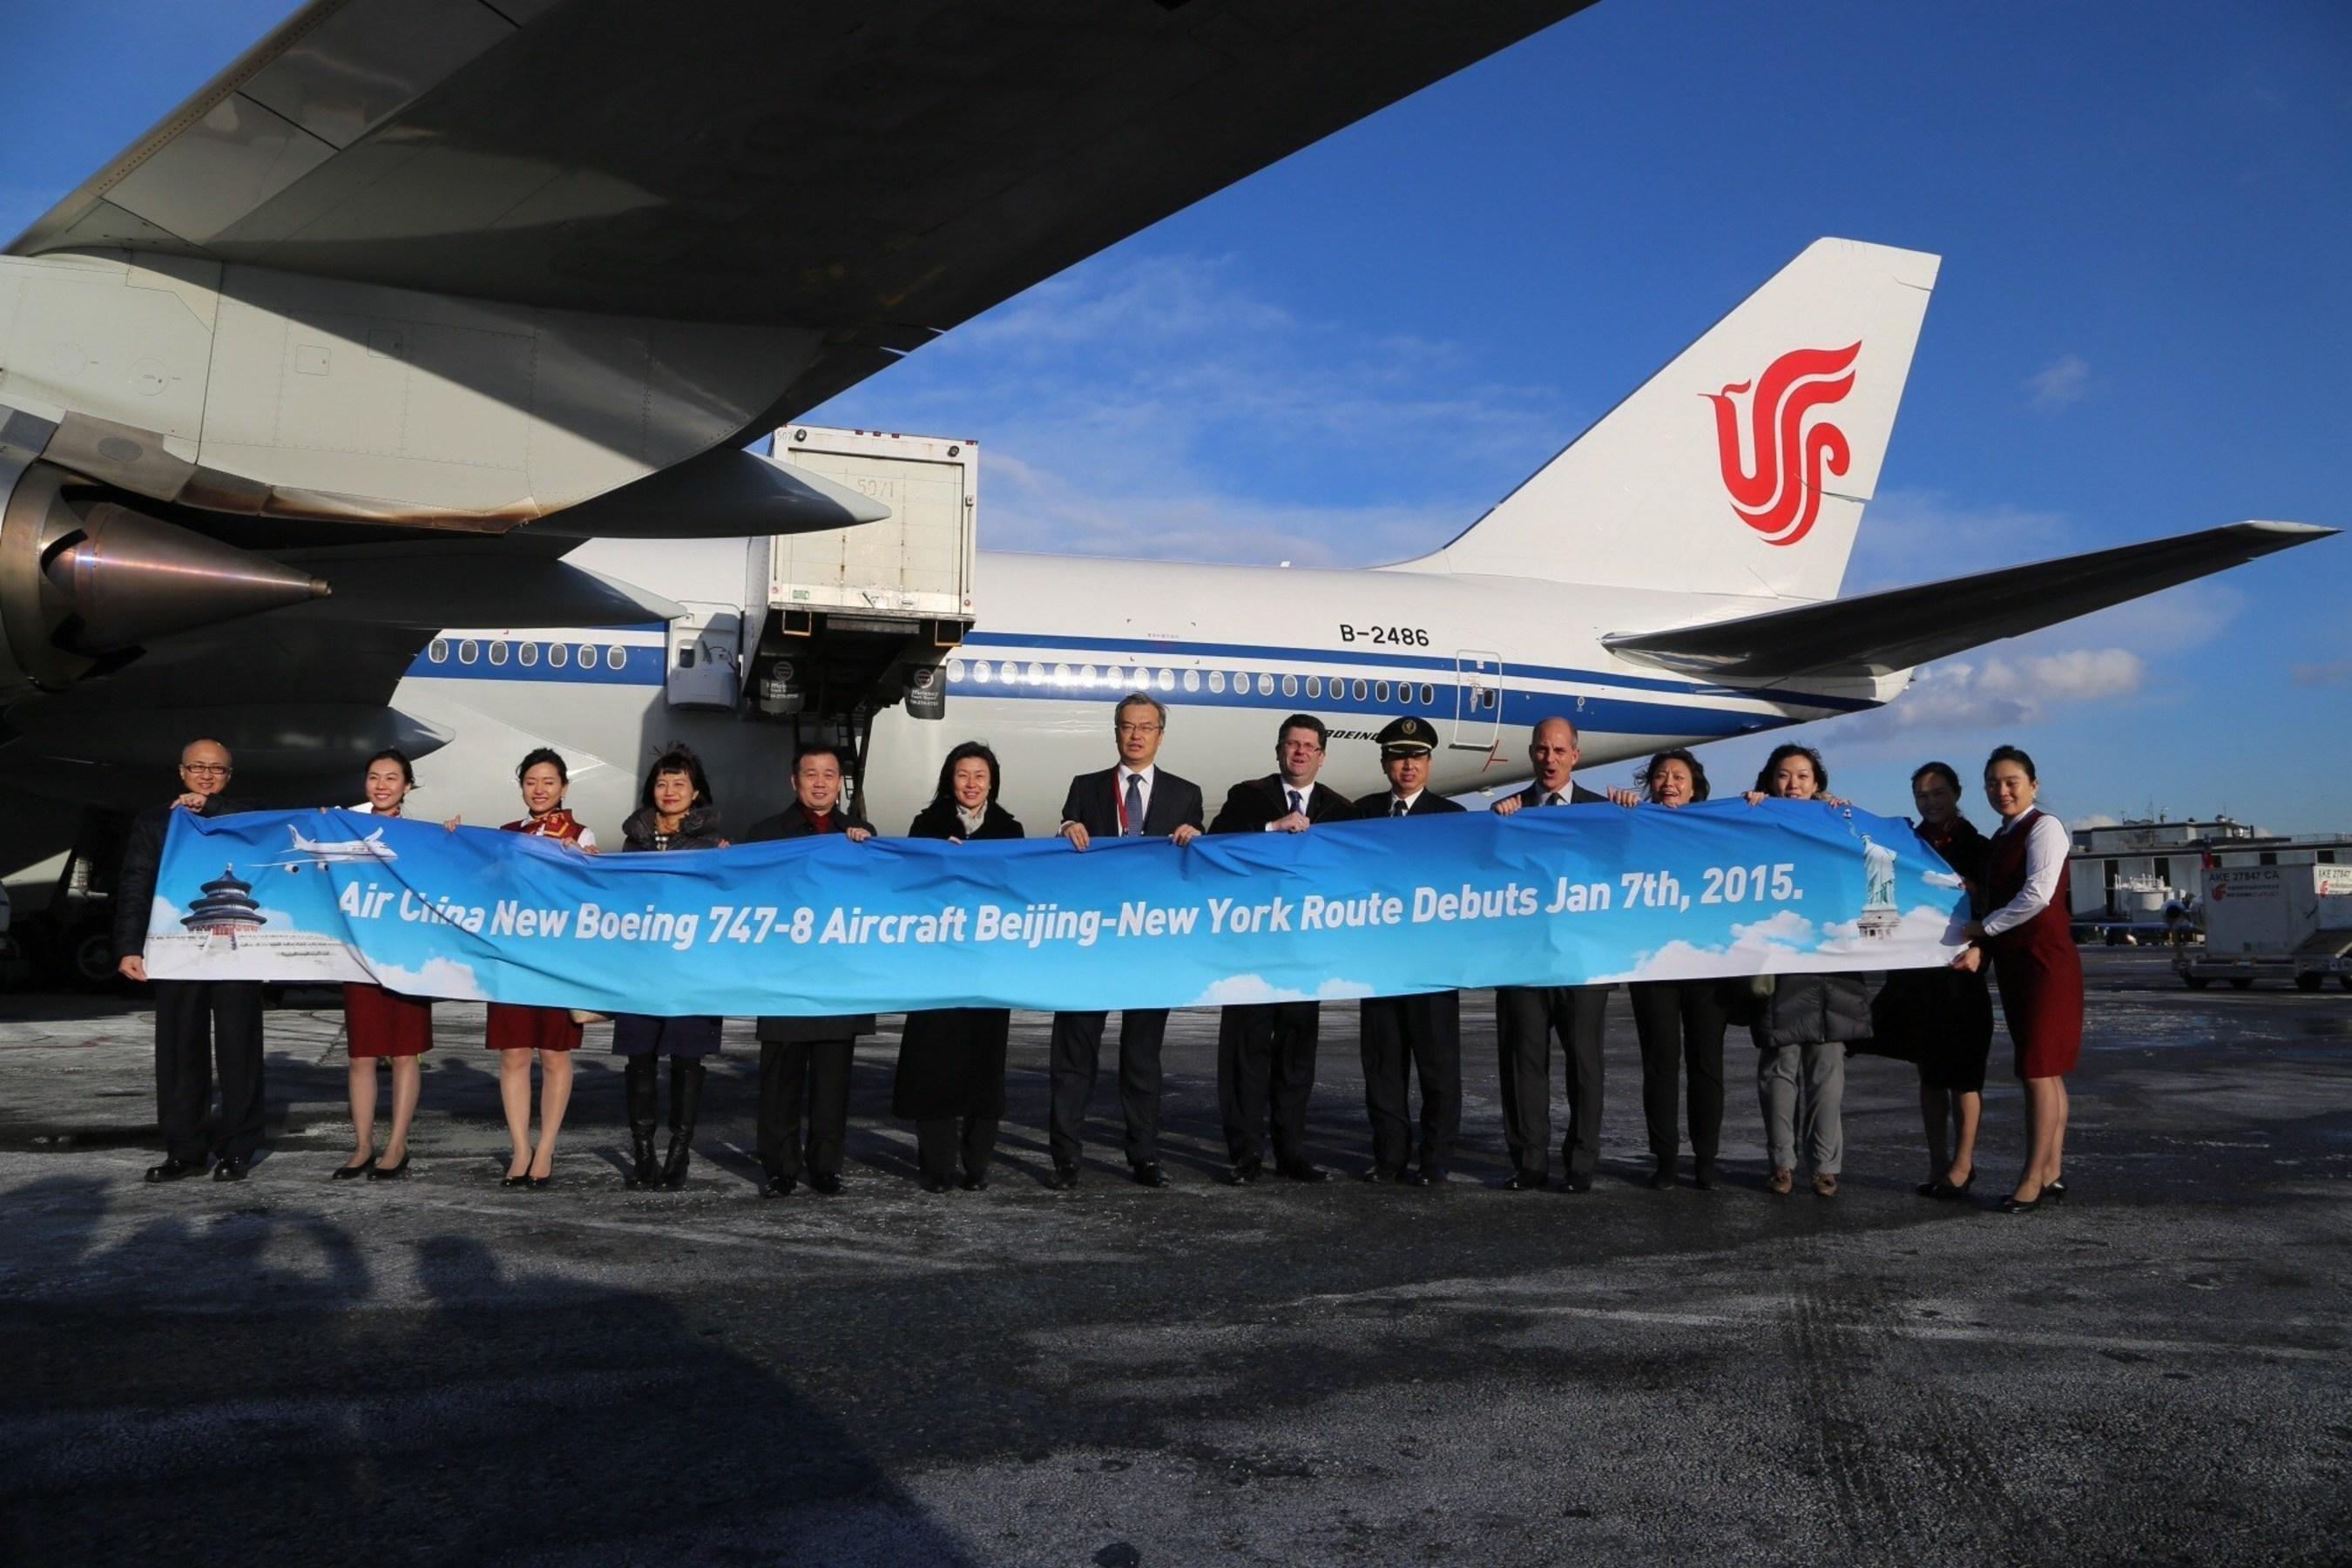 New York Welcomes Air China's New-Generation B747-8 Intercontinental